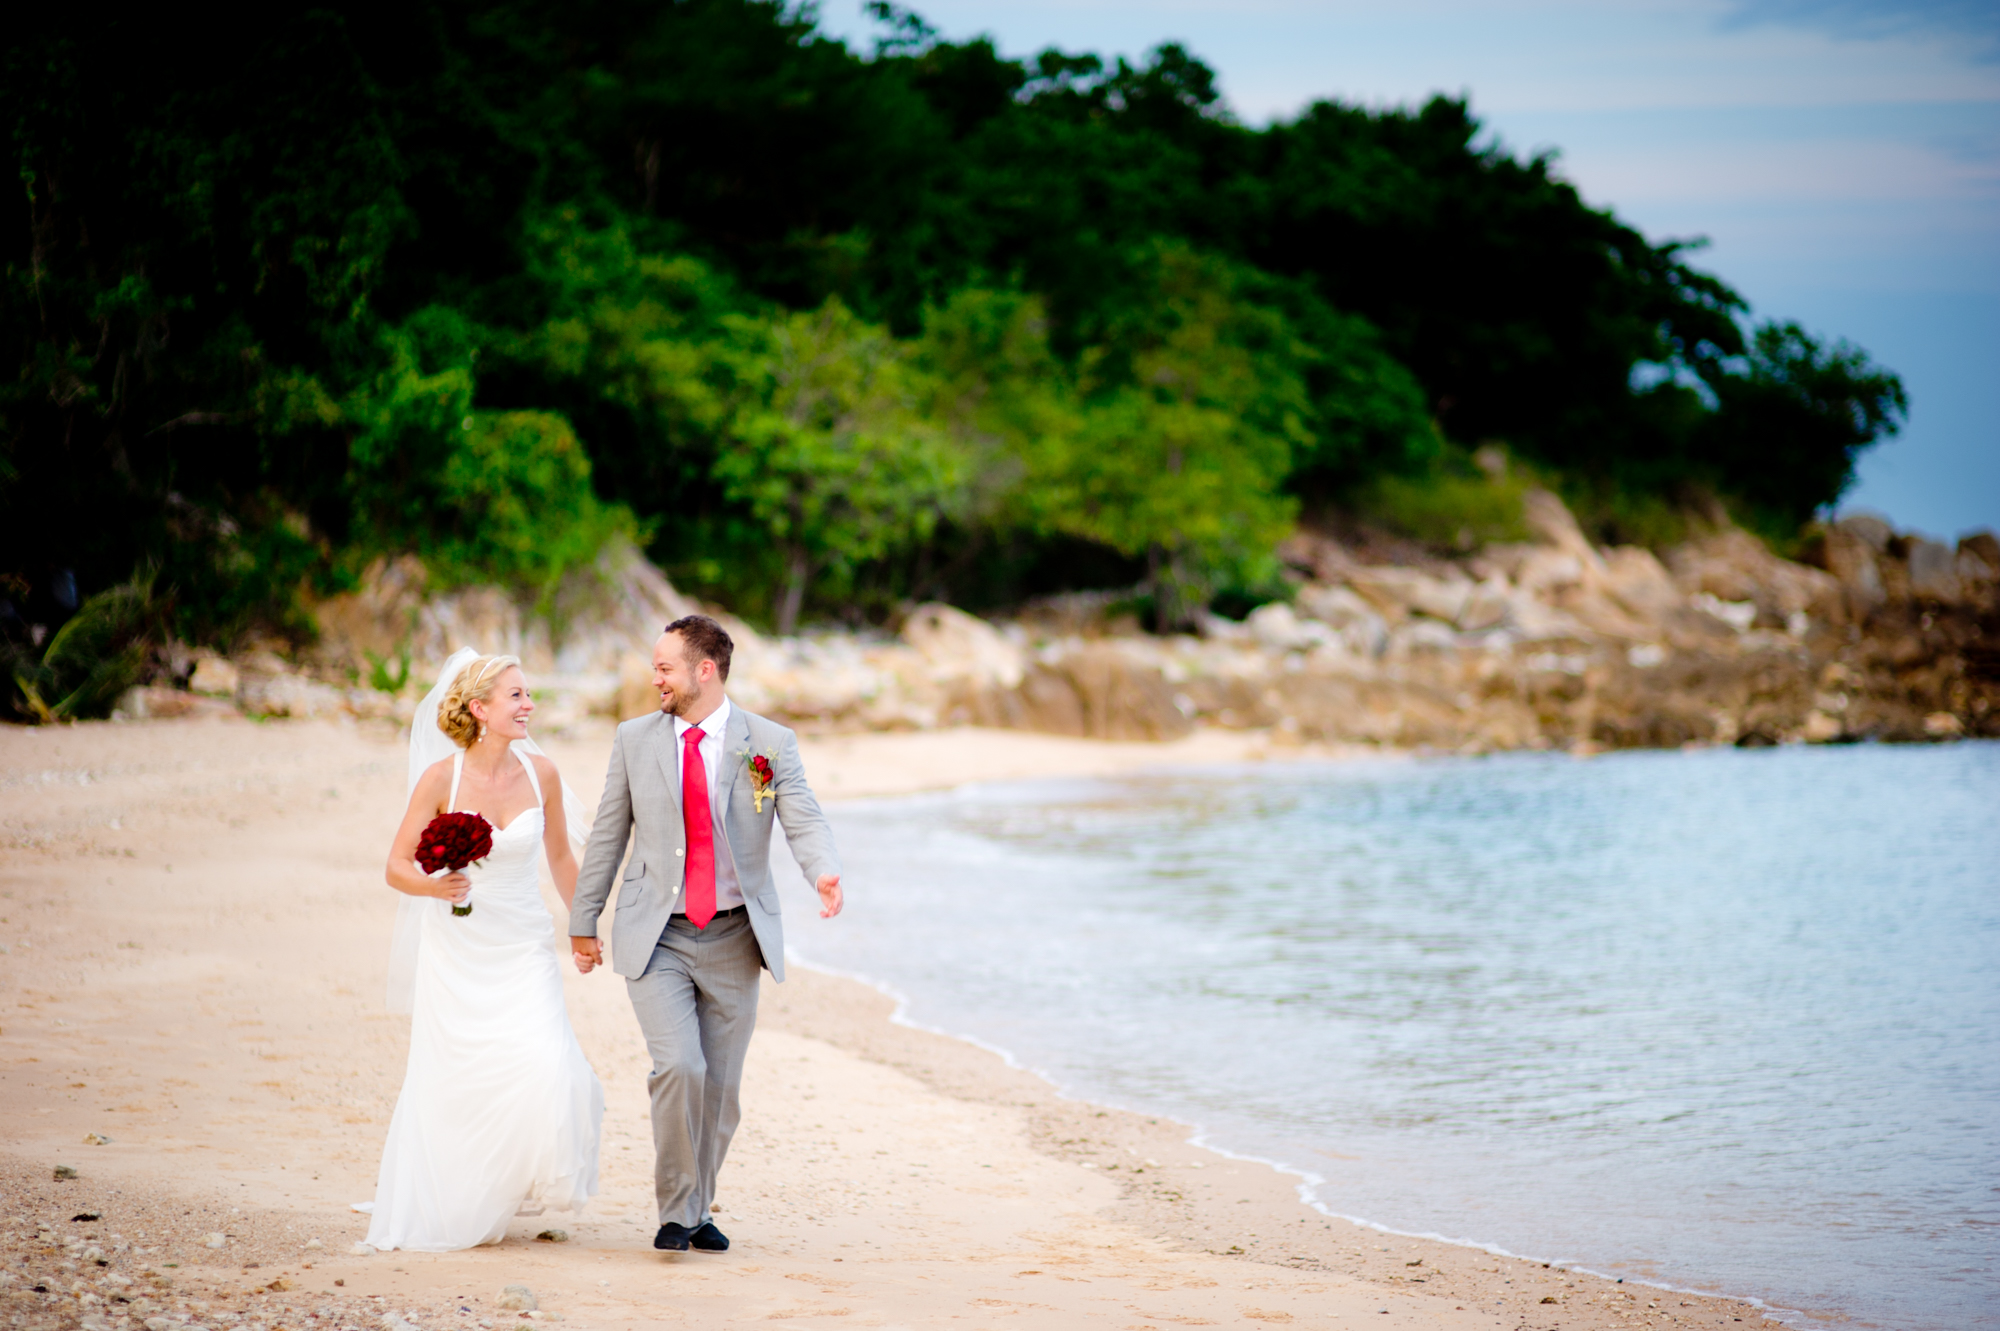 Nora Buri Koh Samui Wedding - Ko Samui Wedding Photographer